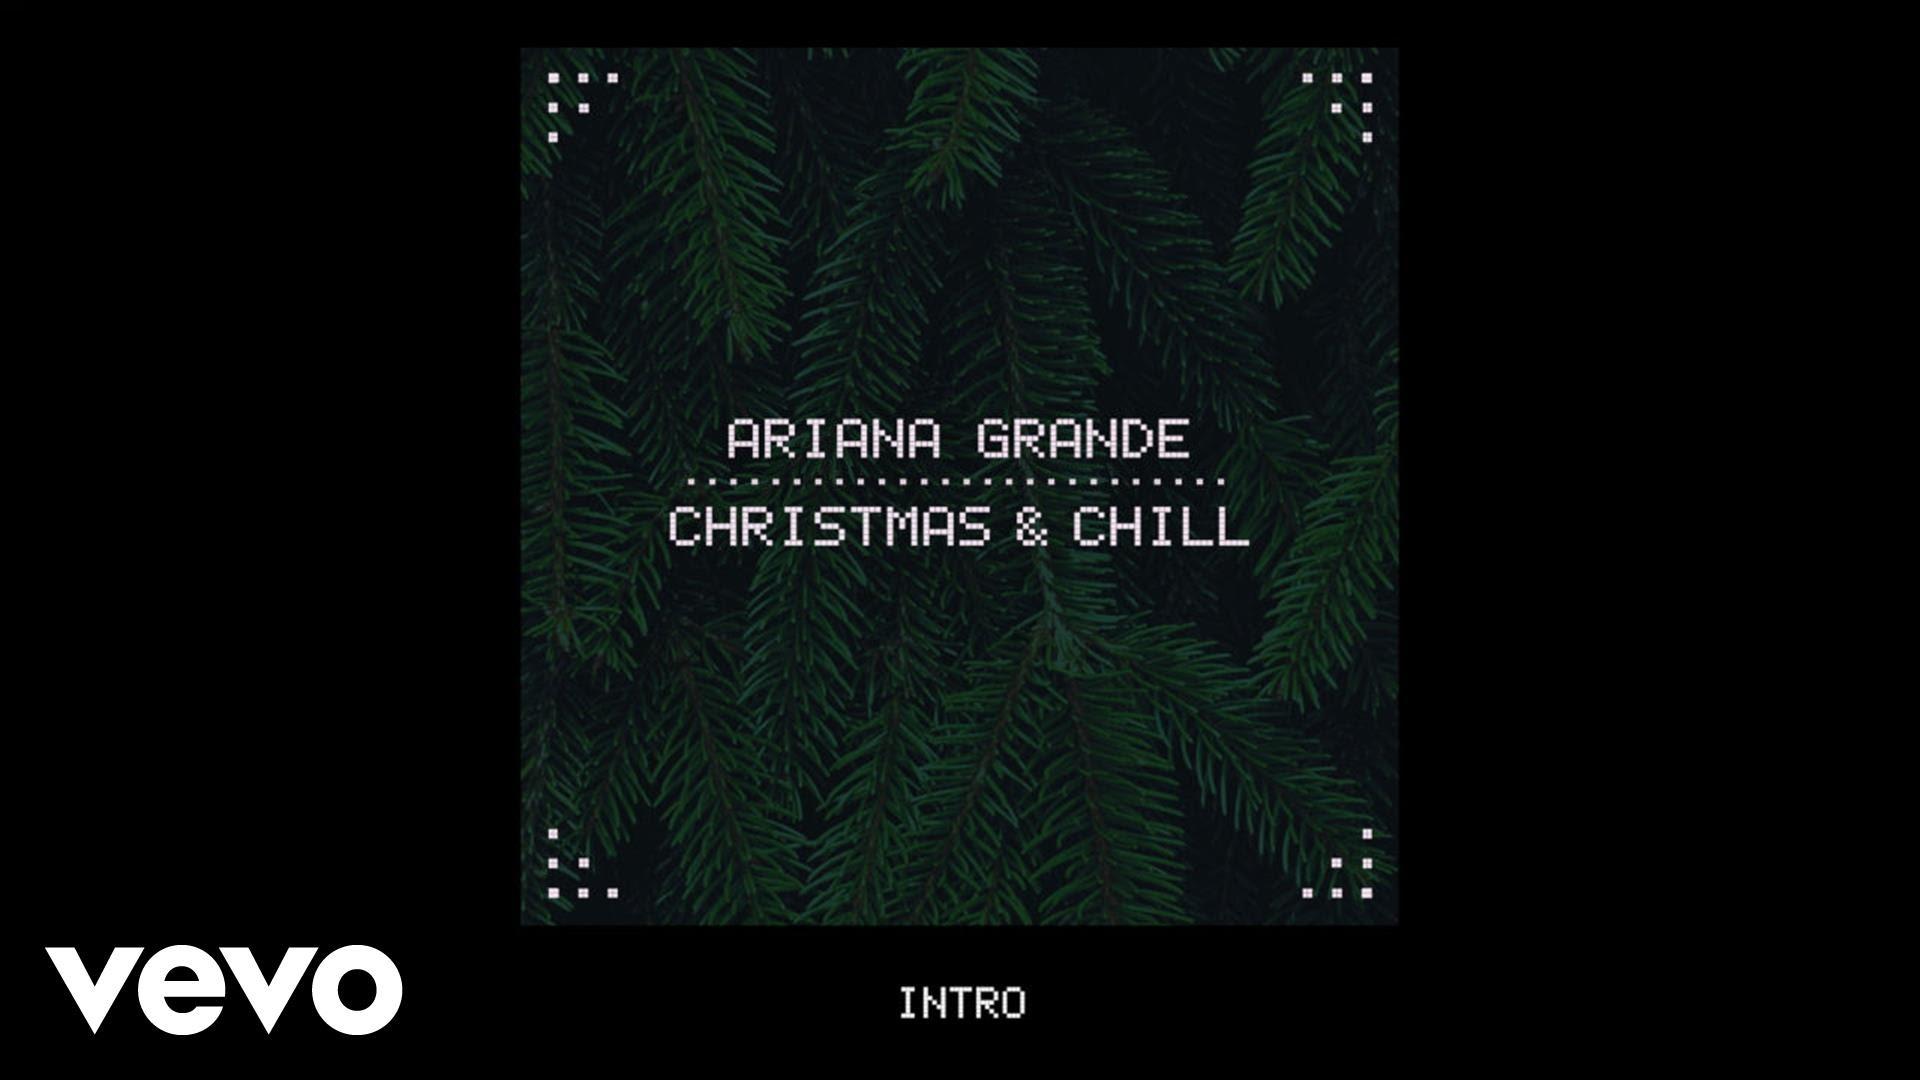 File:Ariana Grande - Intro (Audio).jpg